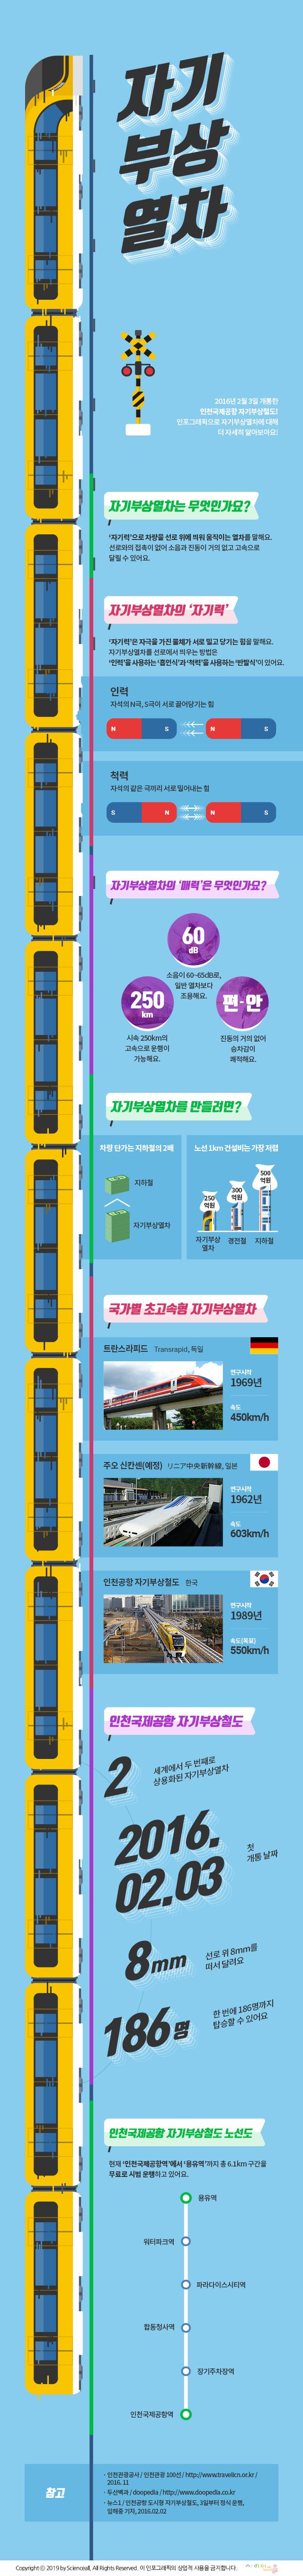 infographic_56호_자기부상열차-web(190813)